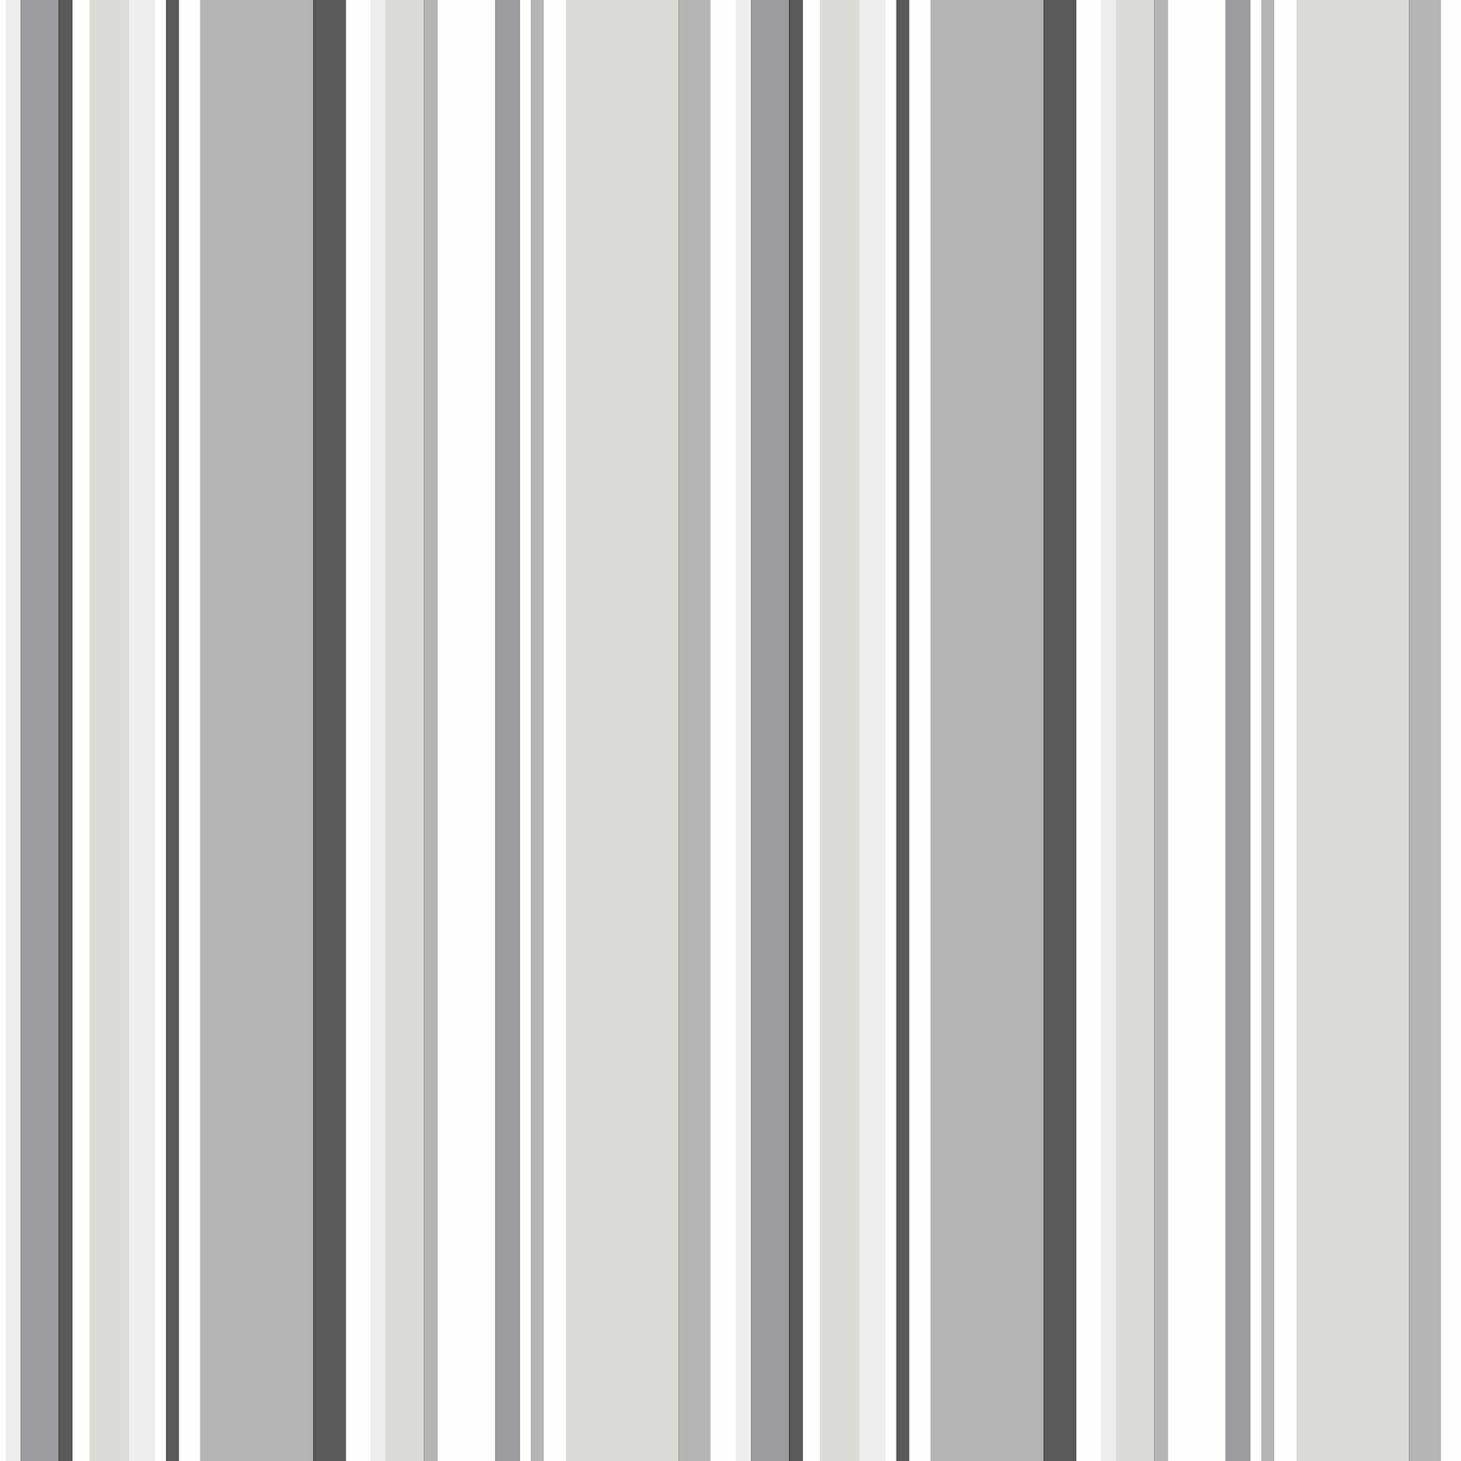 Essener Tapete Simply Stripes 3 SY33962 grey Streifen gestreift Vinyltapete